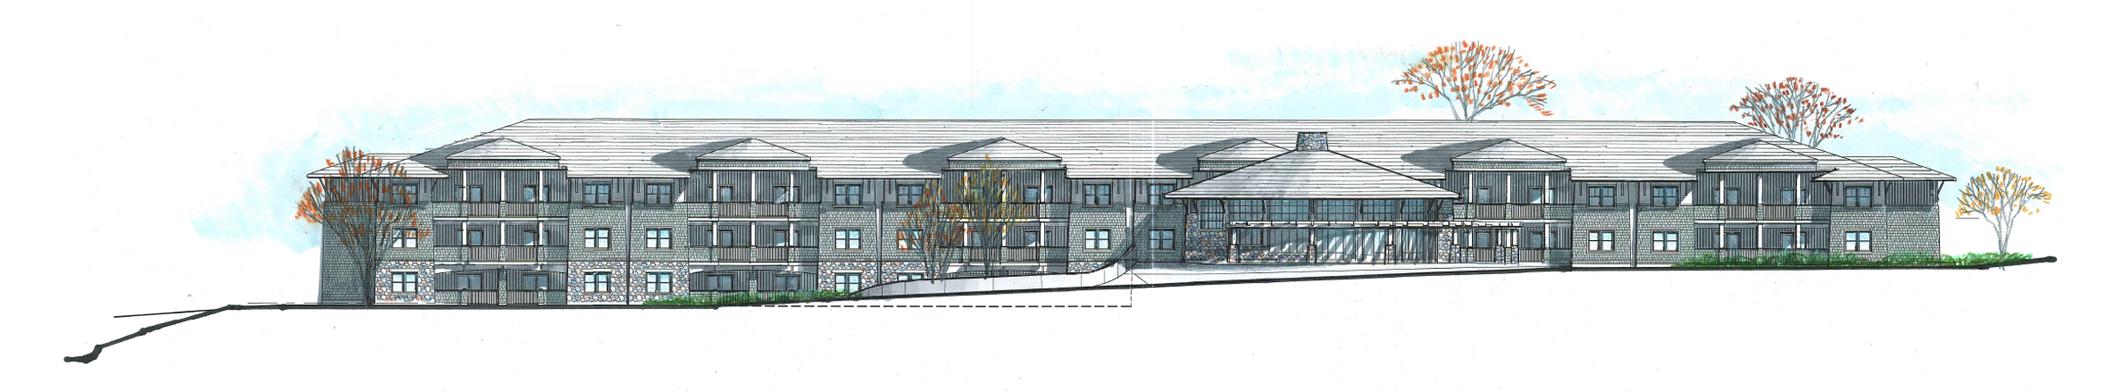 Capital Studio Architects_Enfield Manor